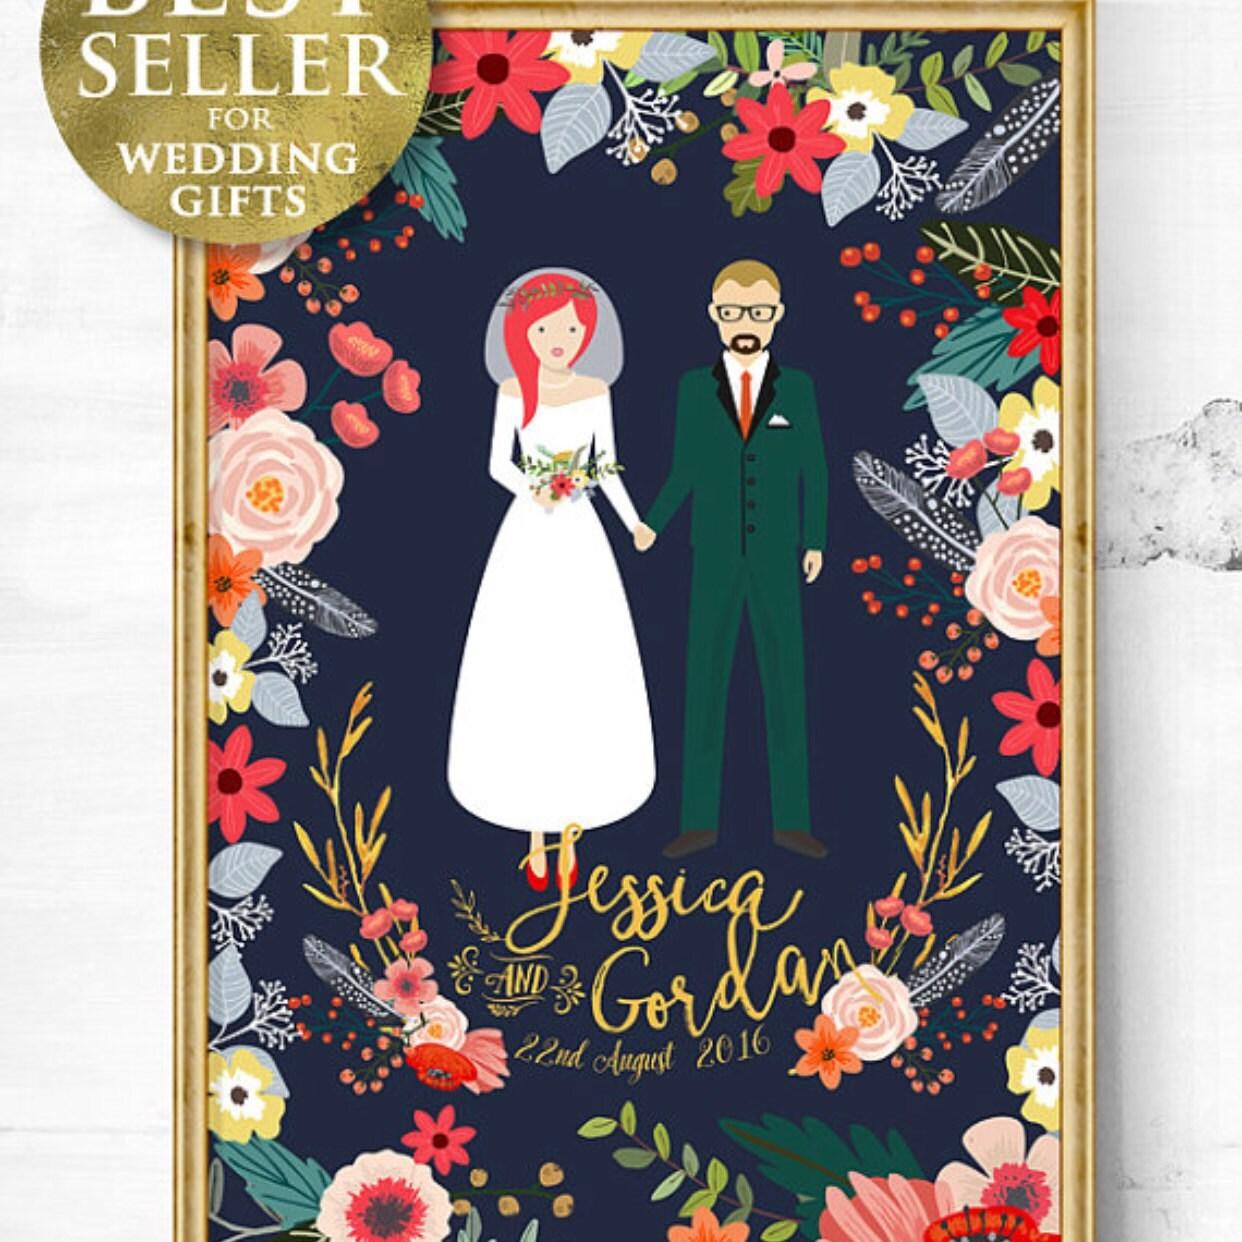 Custom Wedding portrait unique wedding gift Personalized Etsy